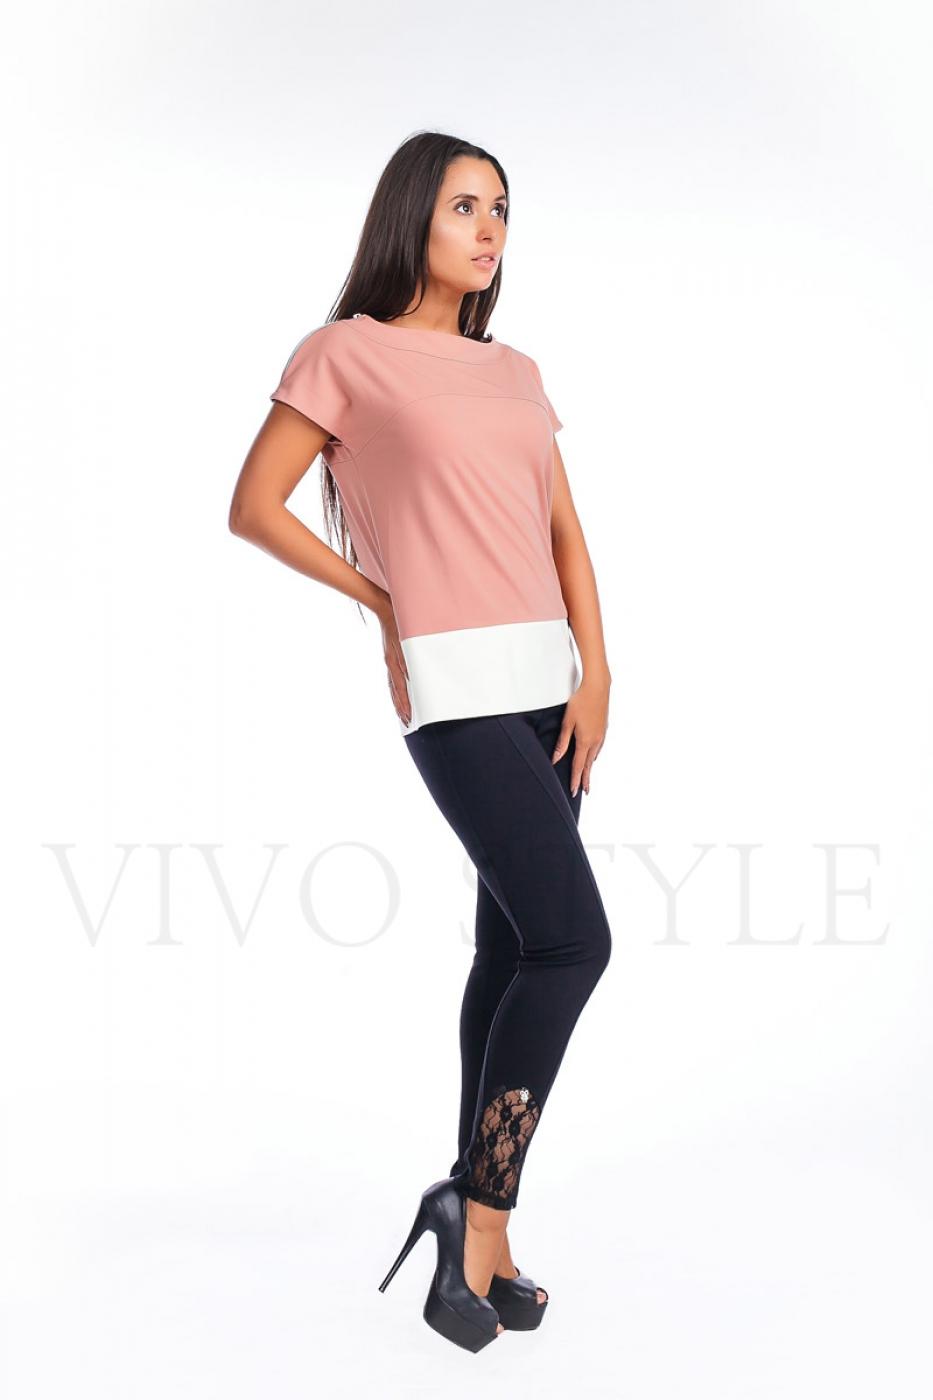 брюки пошив фабрики Vivo-fashion Краснодар